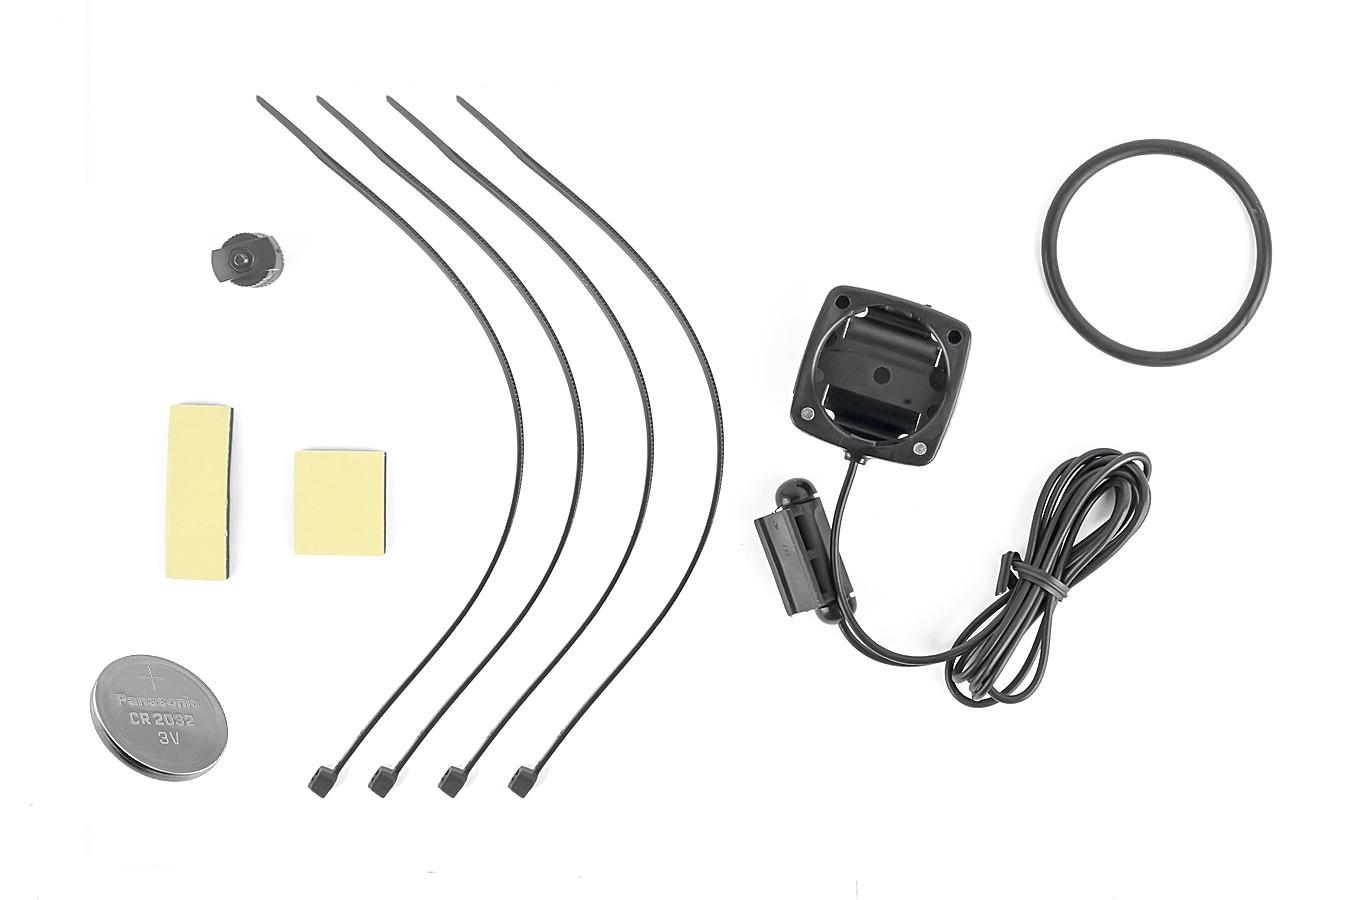 Velocímetro Bike Digital 14 Funções - Sunding